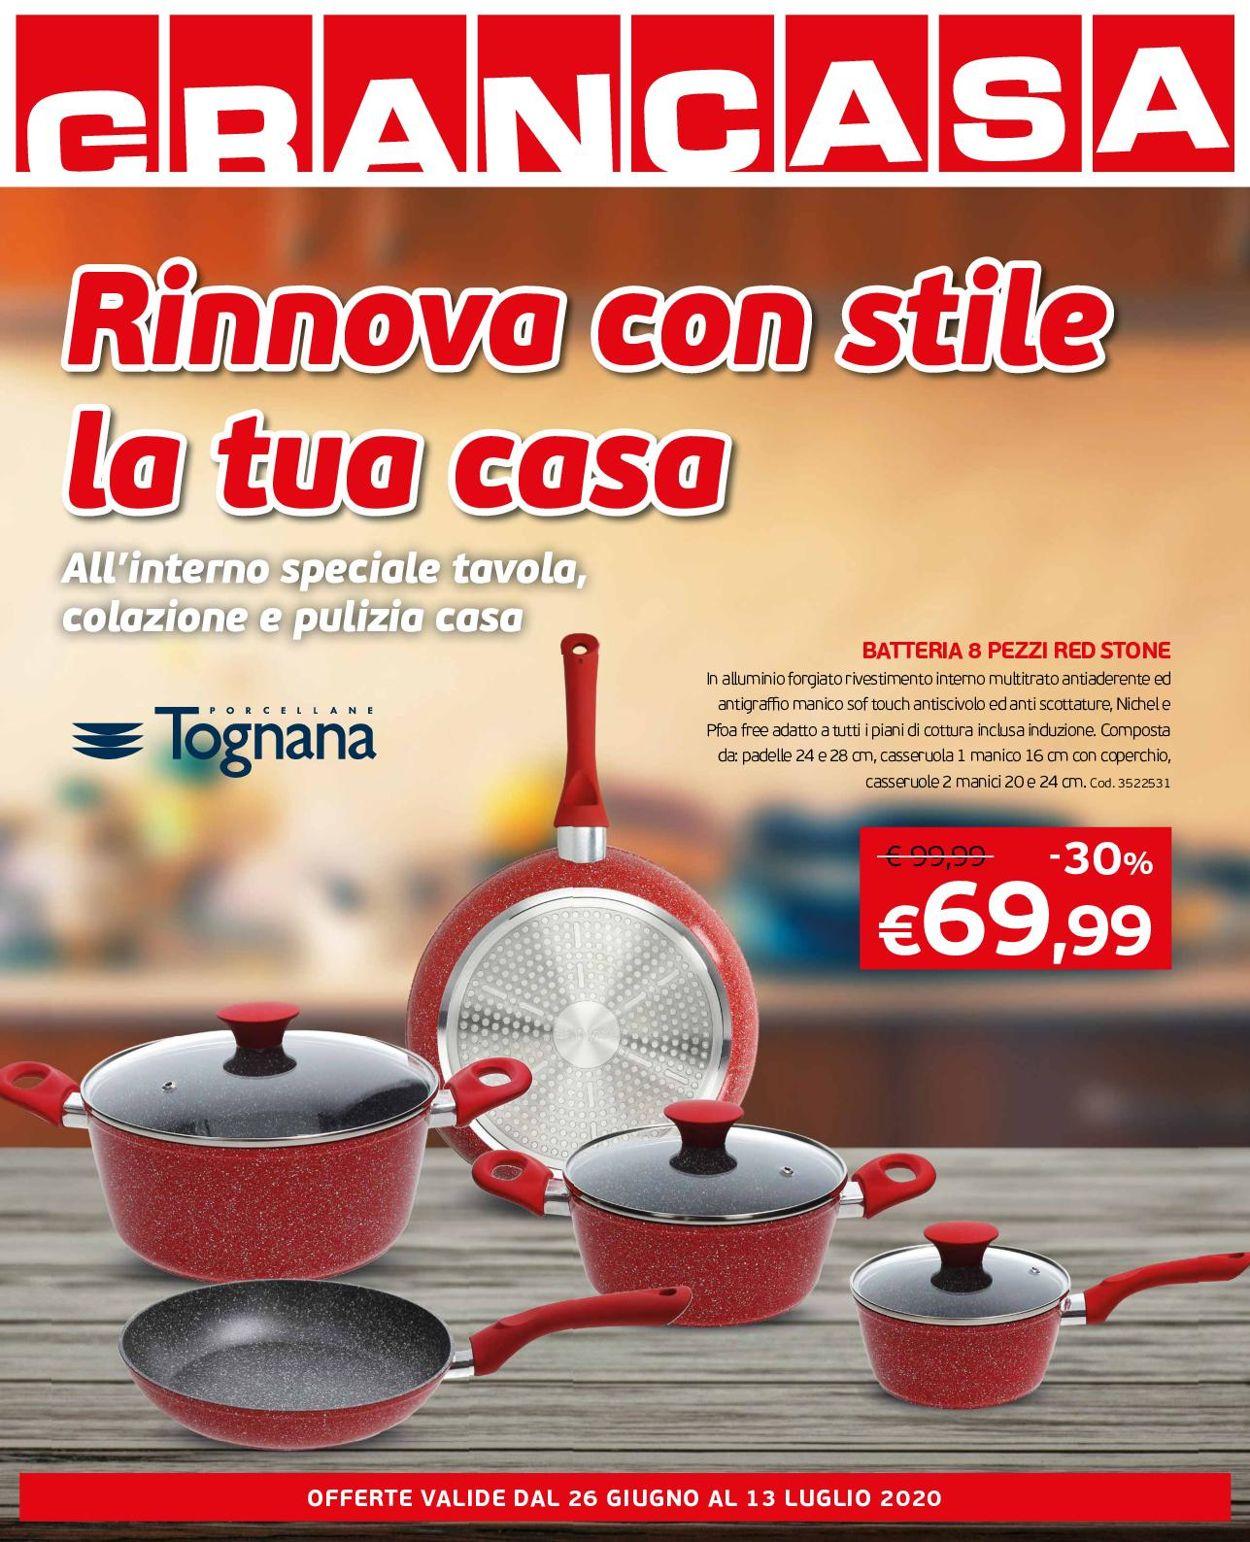 Volantino Grancasa - Offerte 26/06-13/07/2020